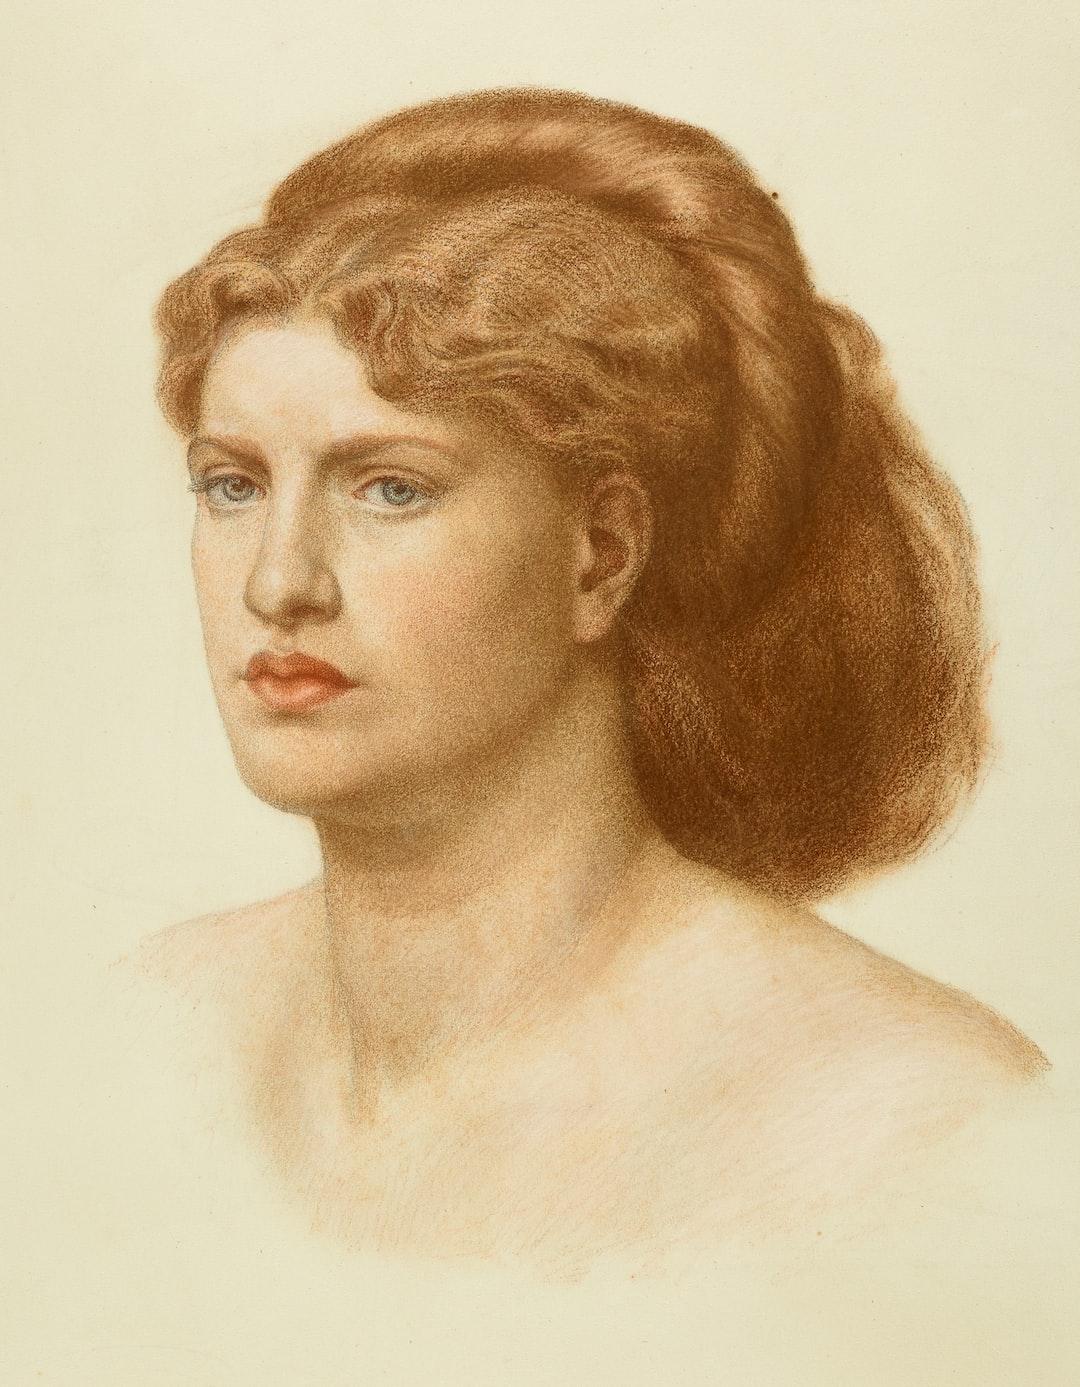 Portrait of Fanny Cornforth, Head and Shoulders, 1874 by Dante Gabriel Rossetti